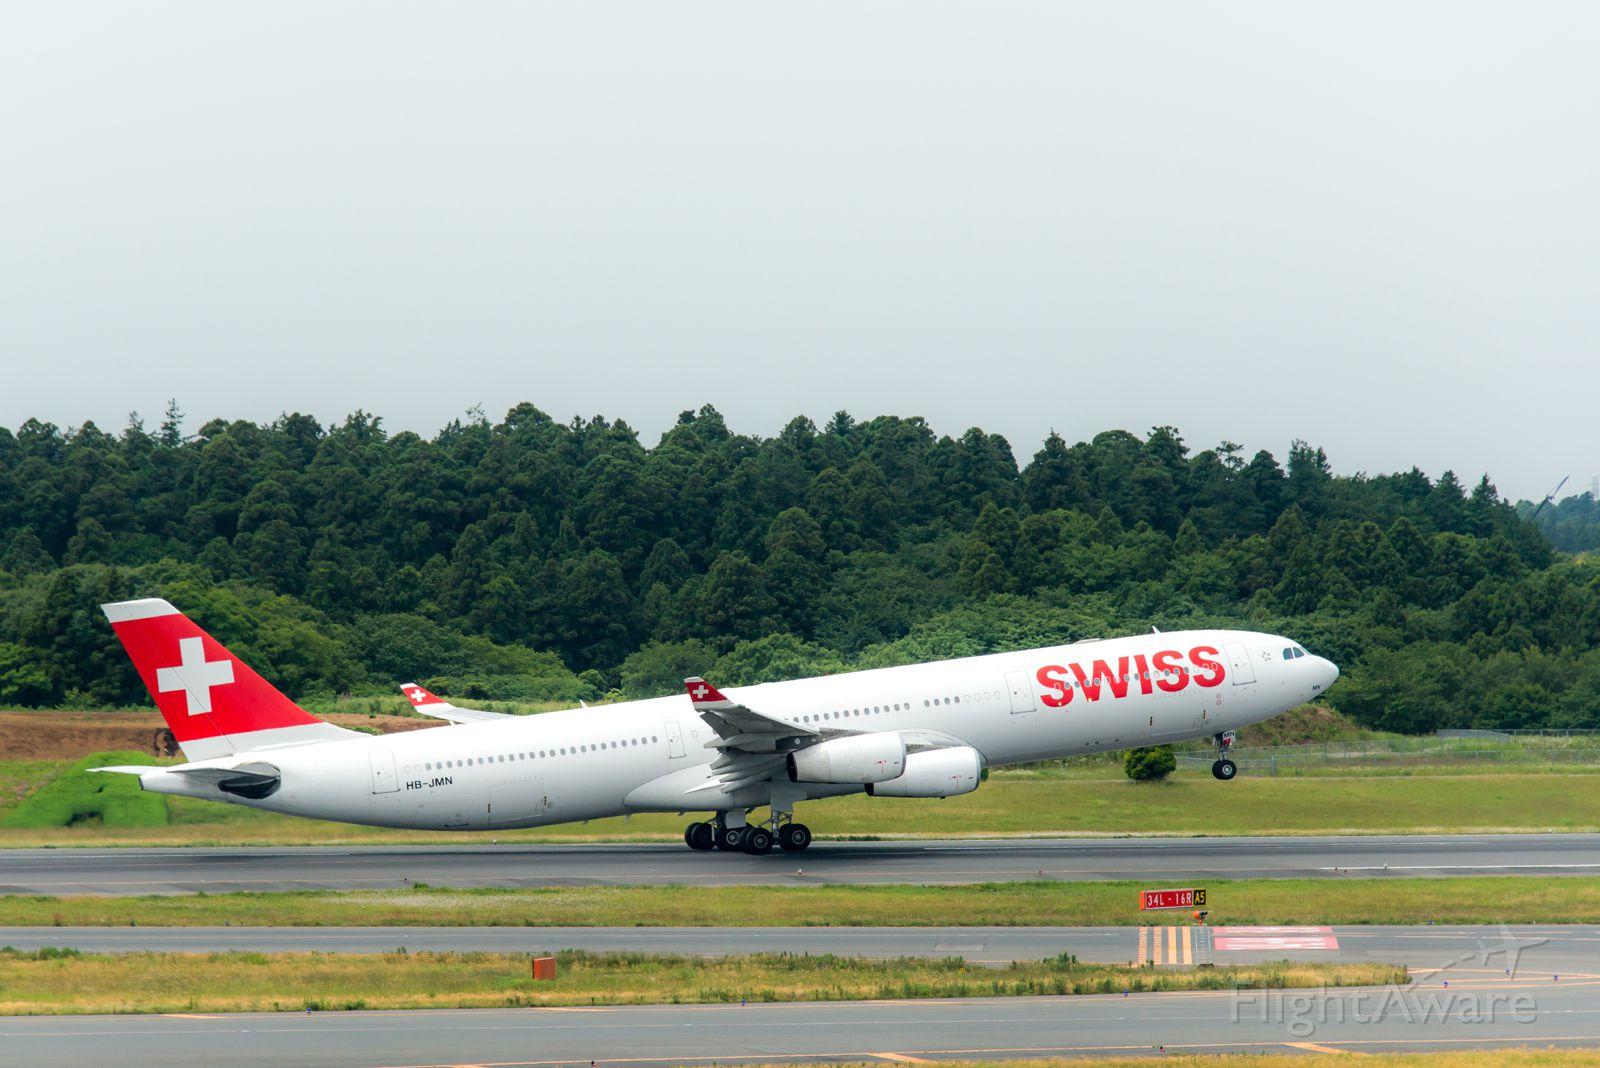 Airbus A330-300 (HB-JMN)